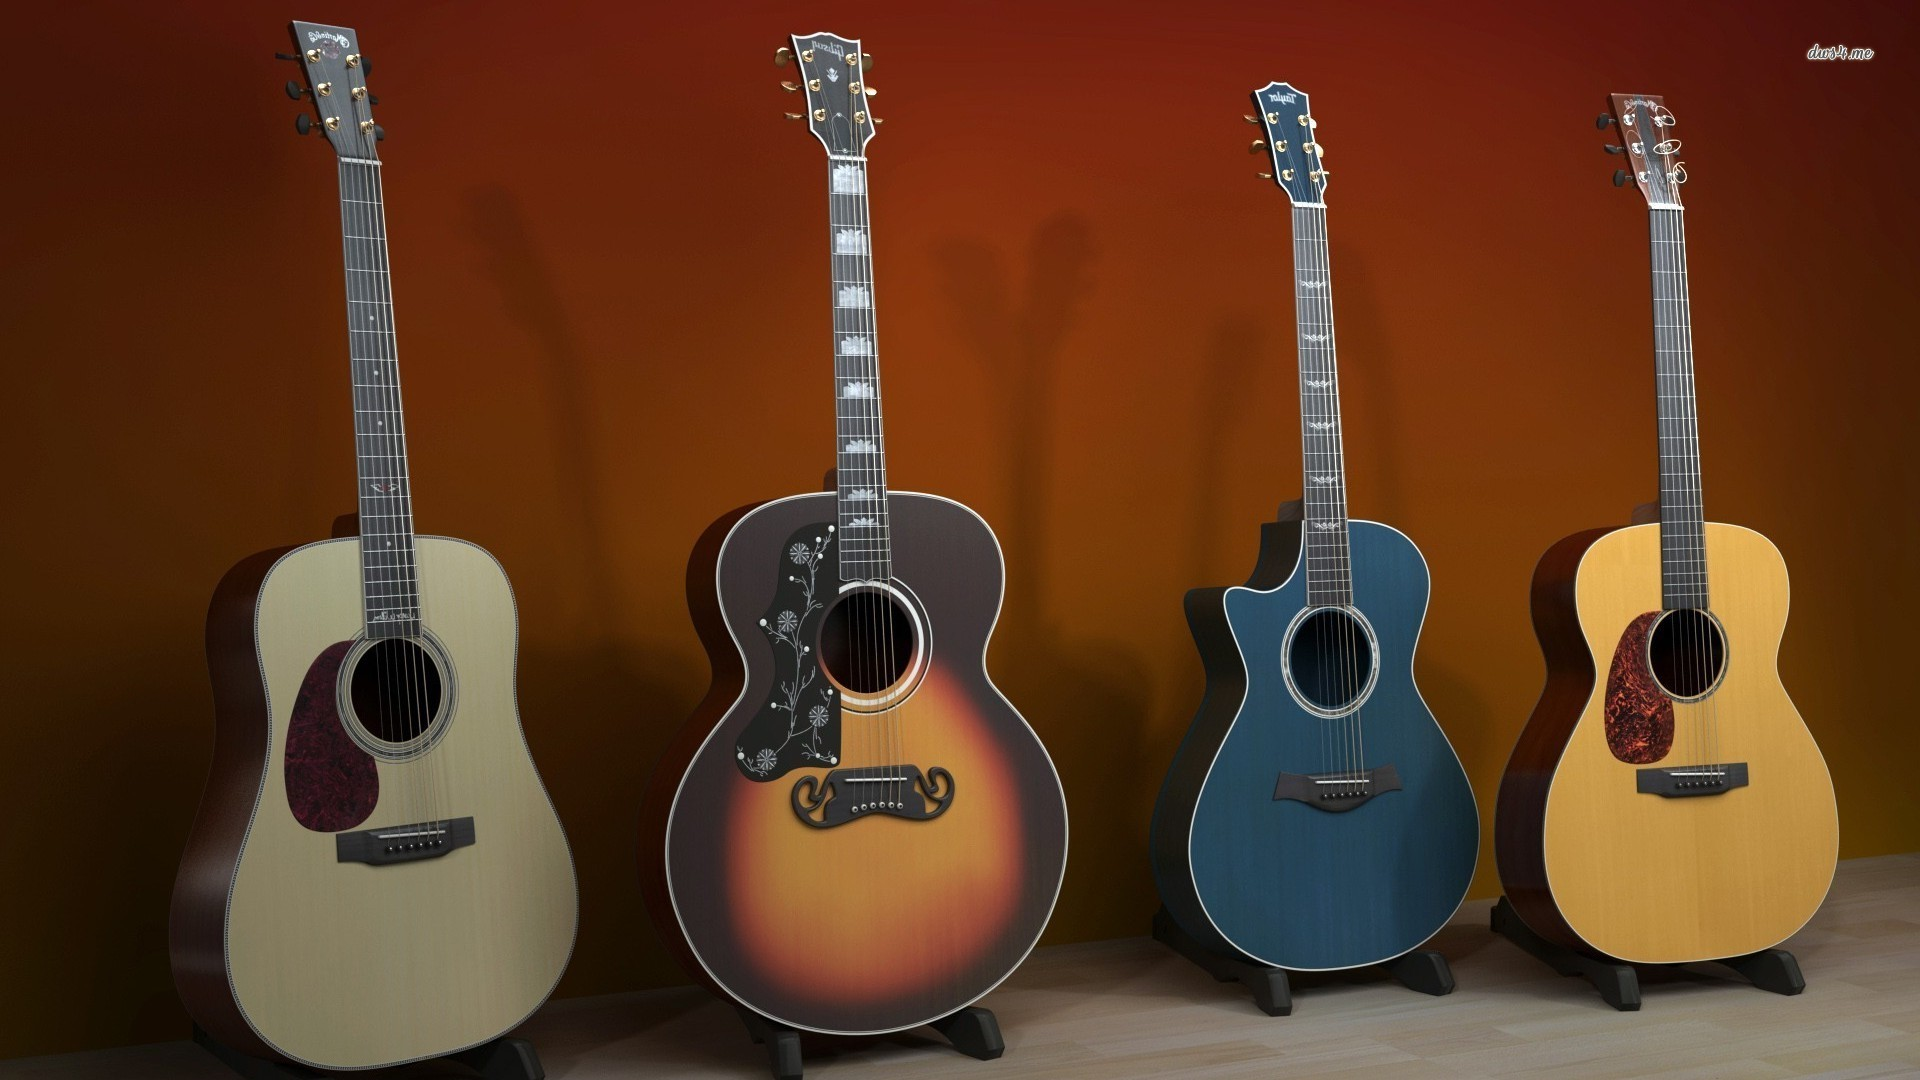 Classical guitars wallpaper   Music wallpapers   8060 1920x1080